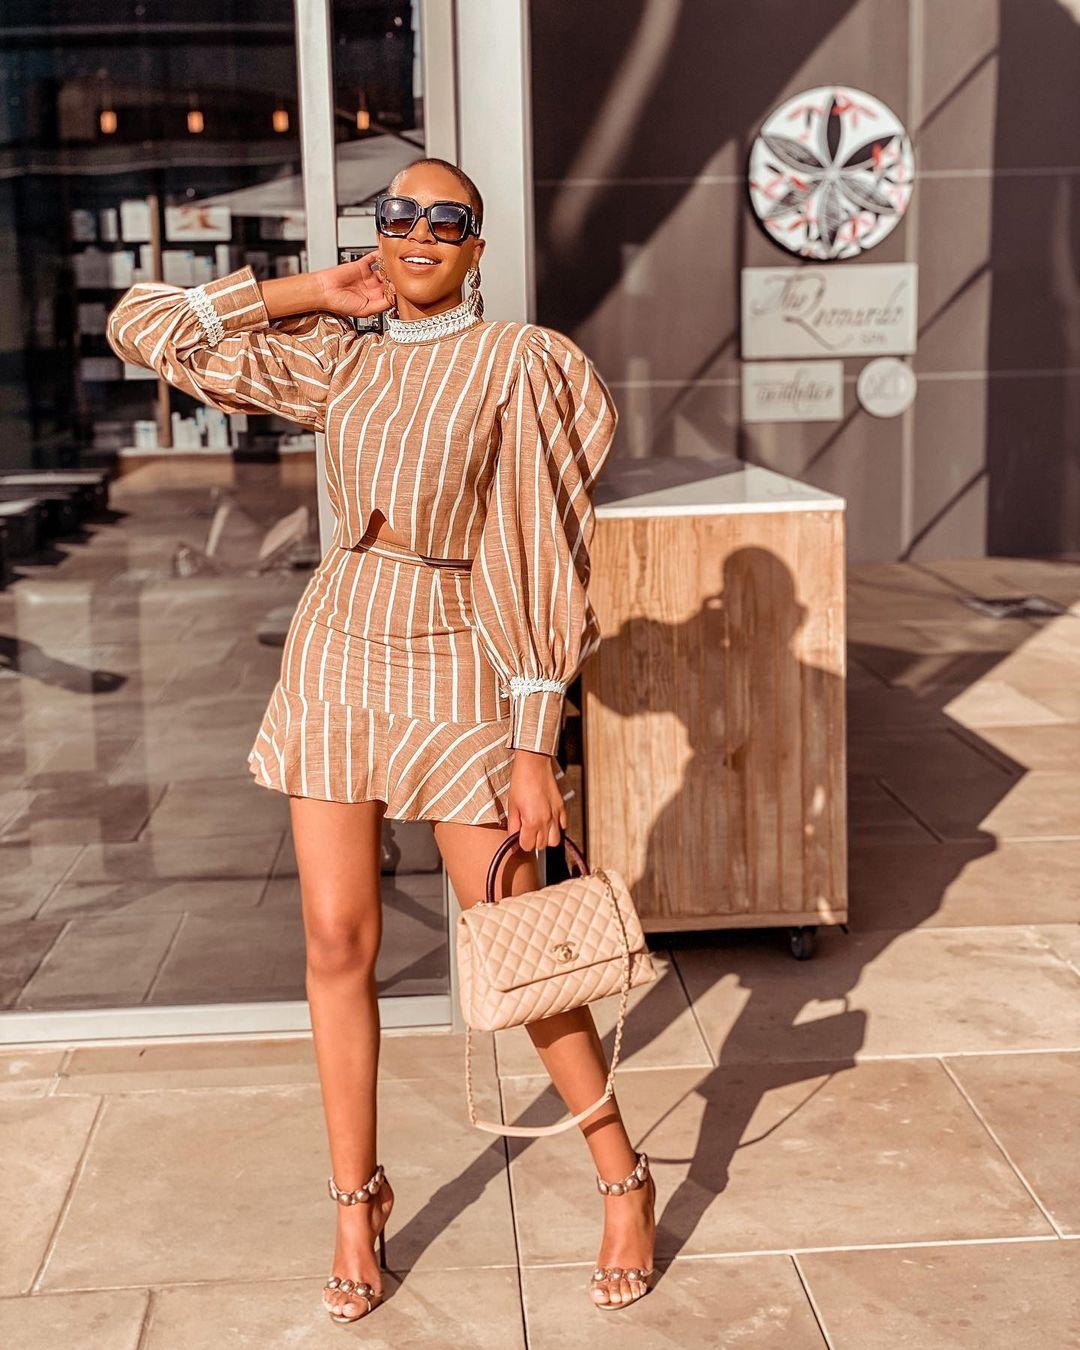 chic-stylish-instagram-african-celebs-celebrities